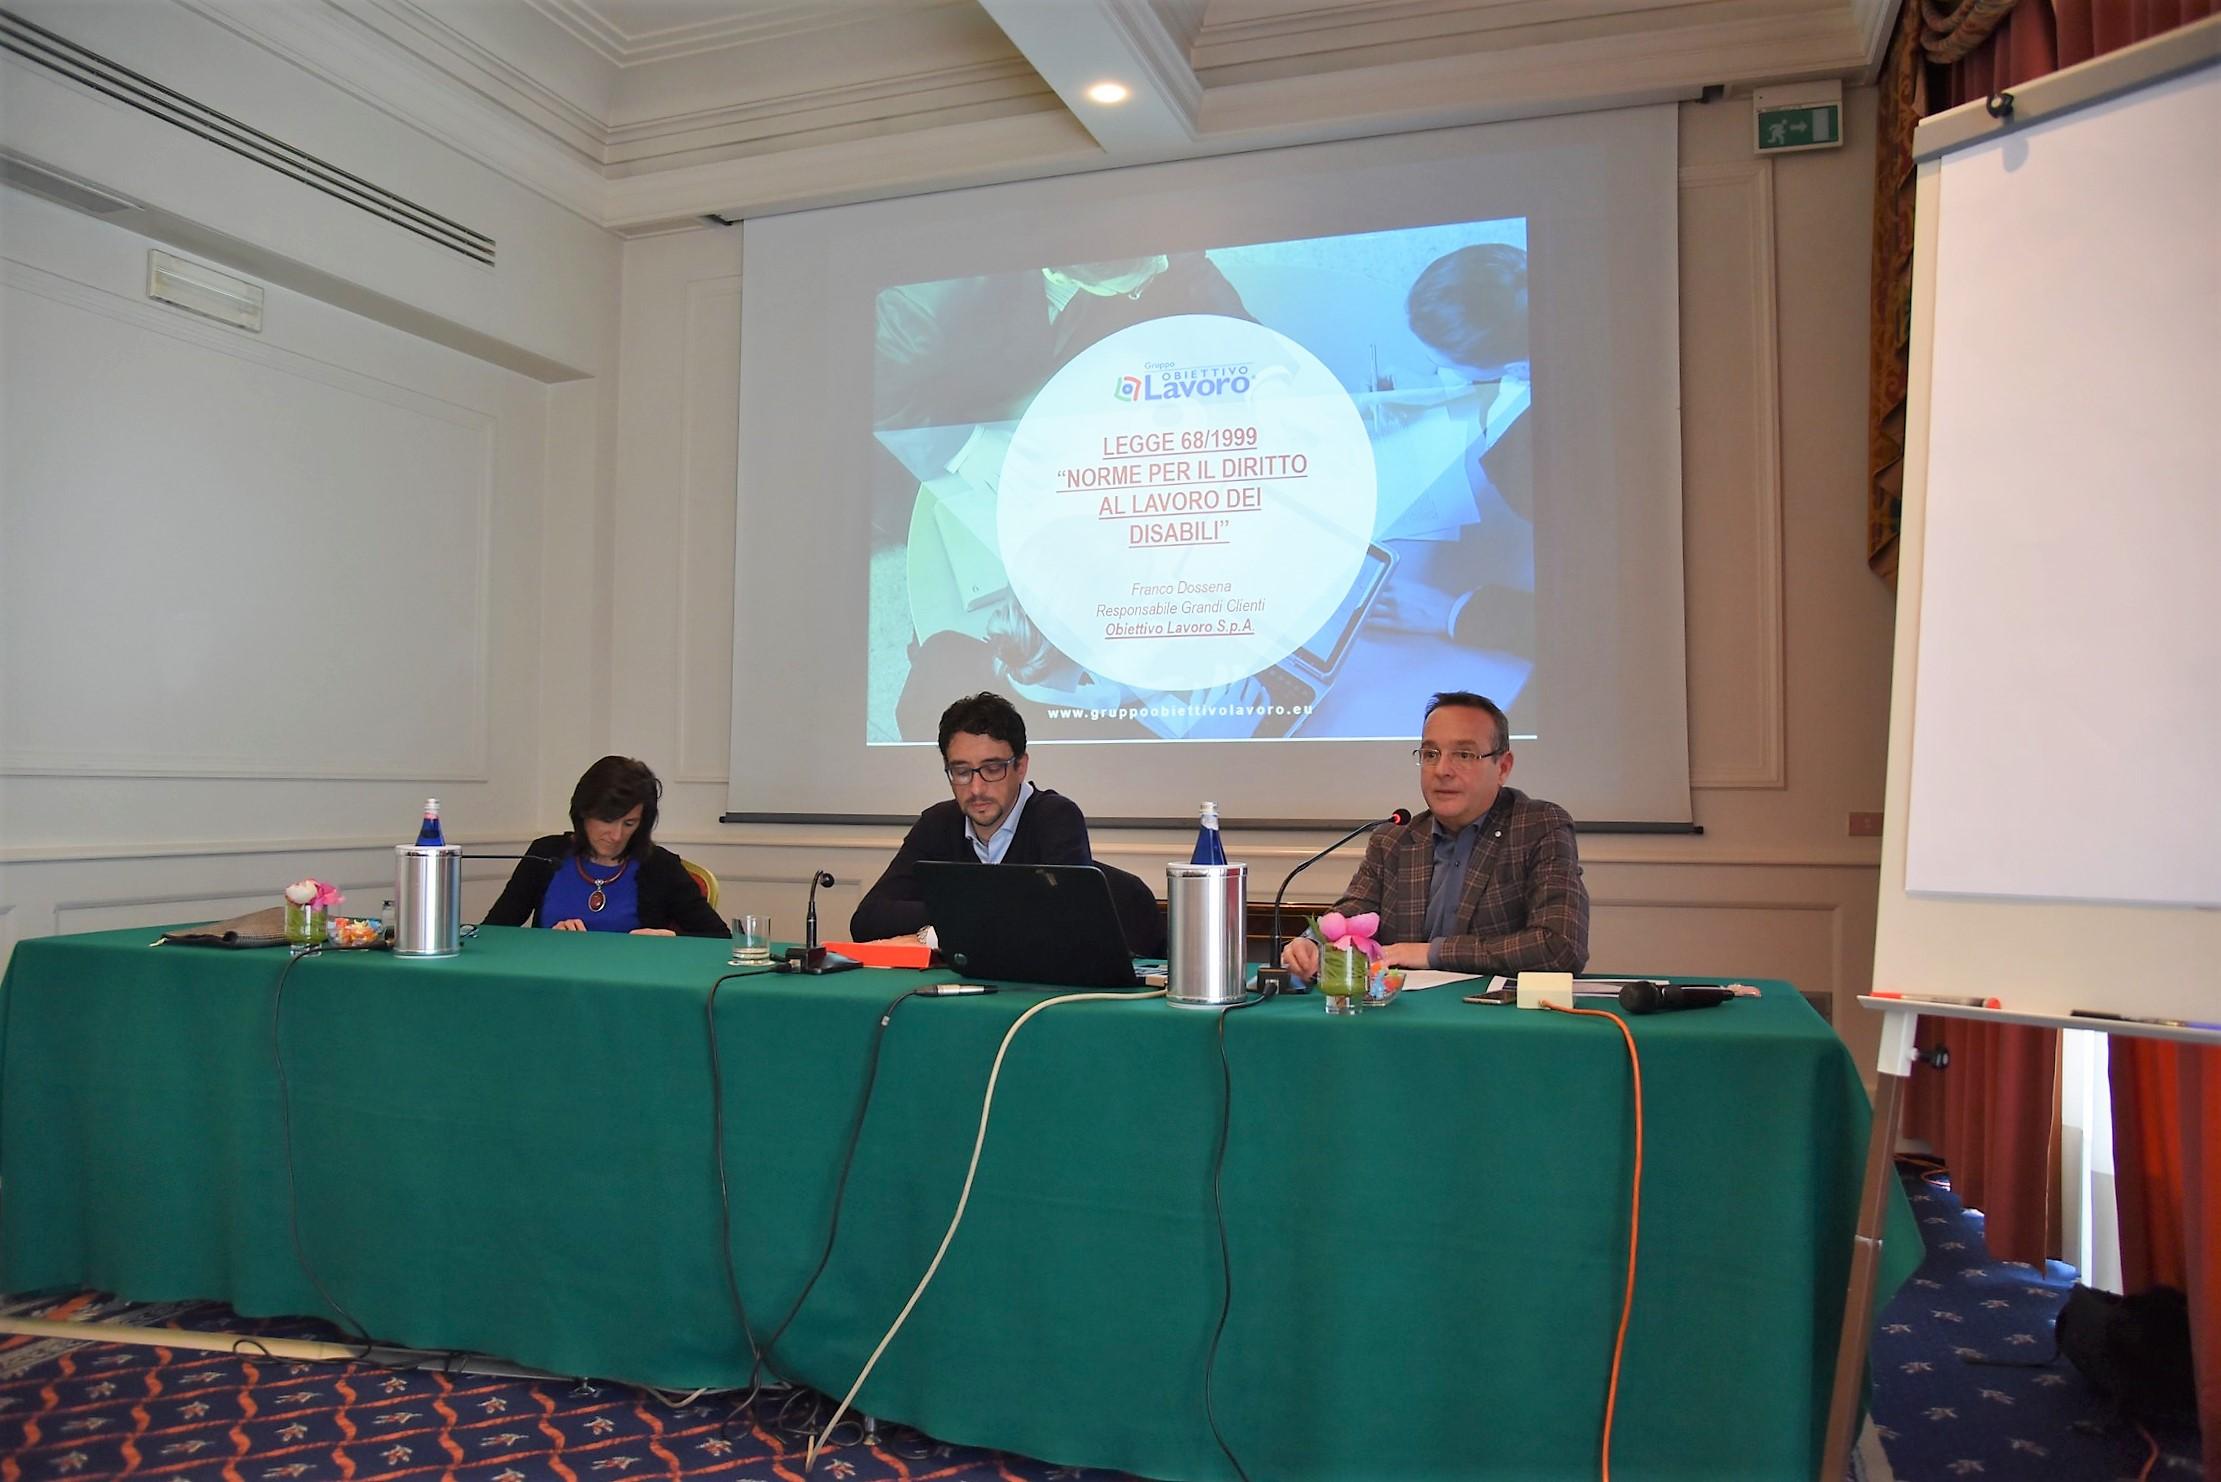 Elena Gaiani, Alberto Garnero, Franco Dossena